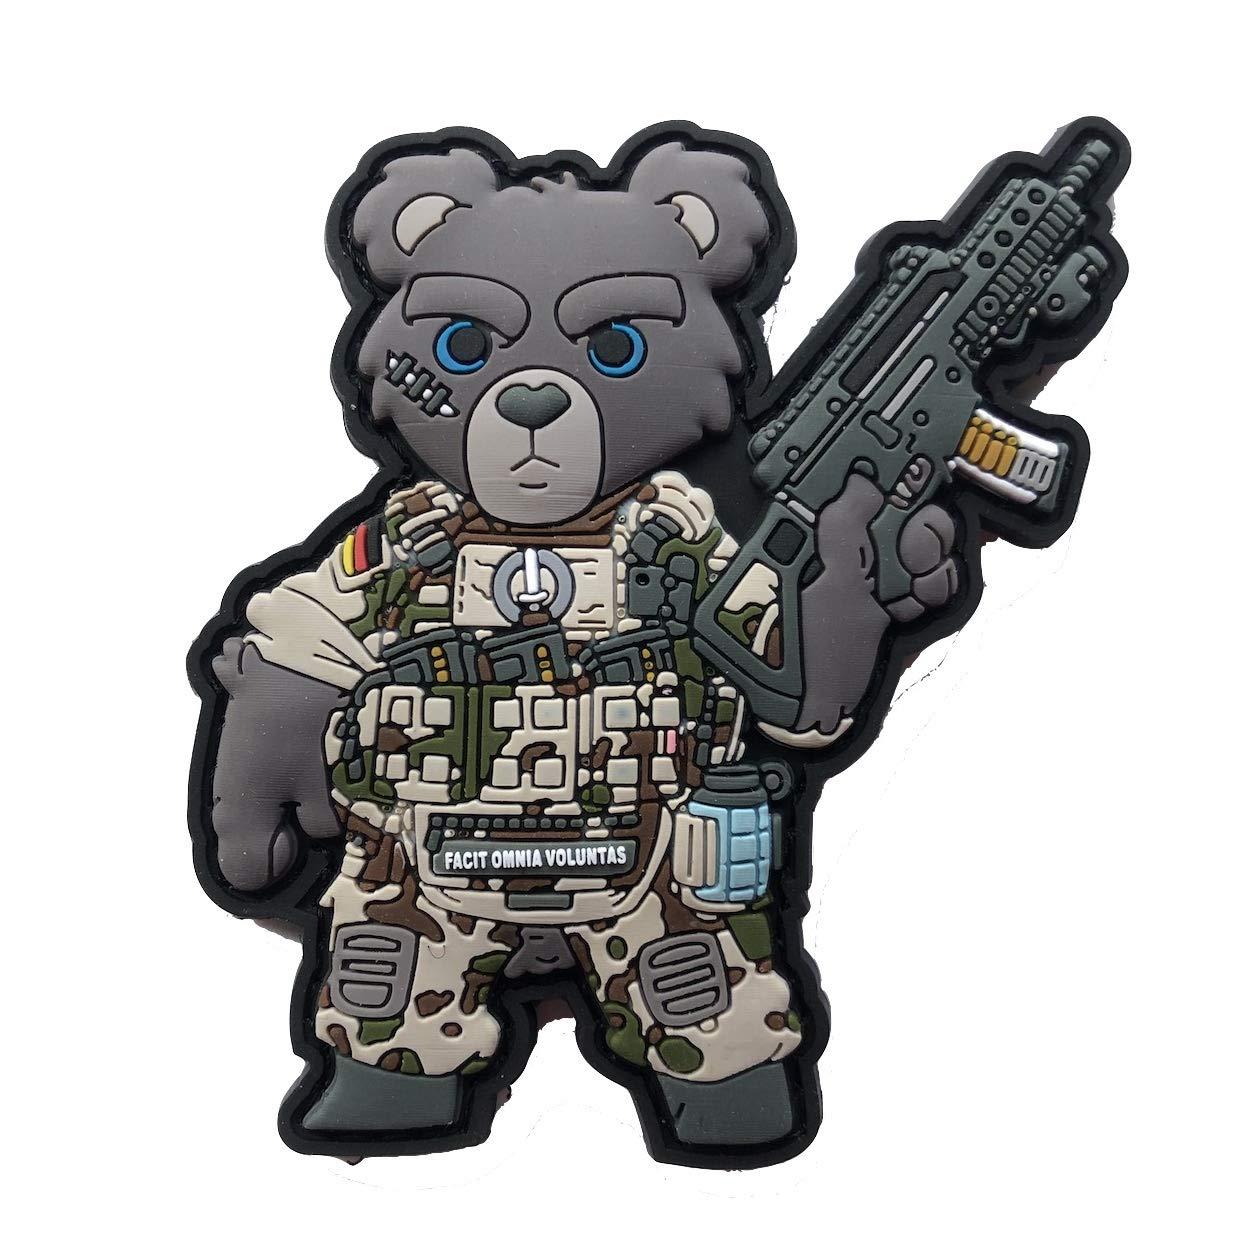 TACOPSGEAR Teddy Teddybä r Teddy Bä r Bundeswehr Soldat Armee Heer Tropentarn Patch